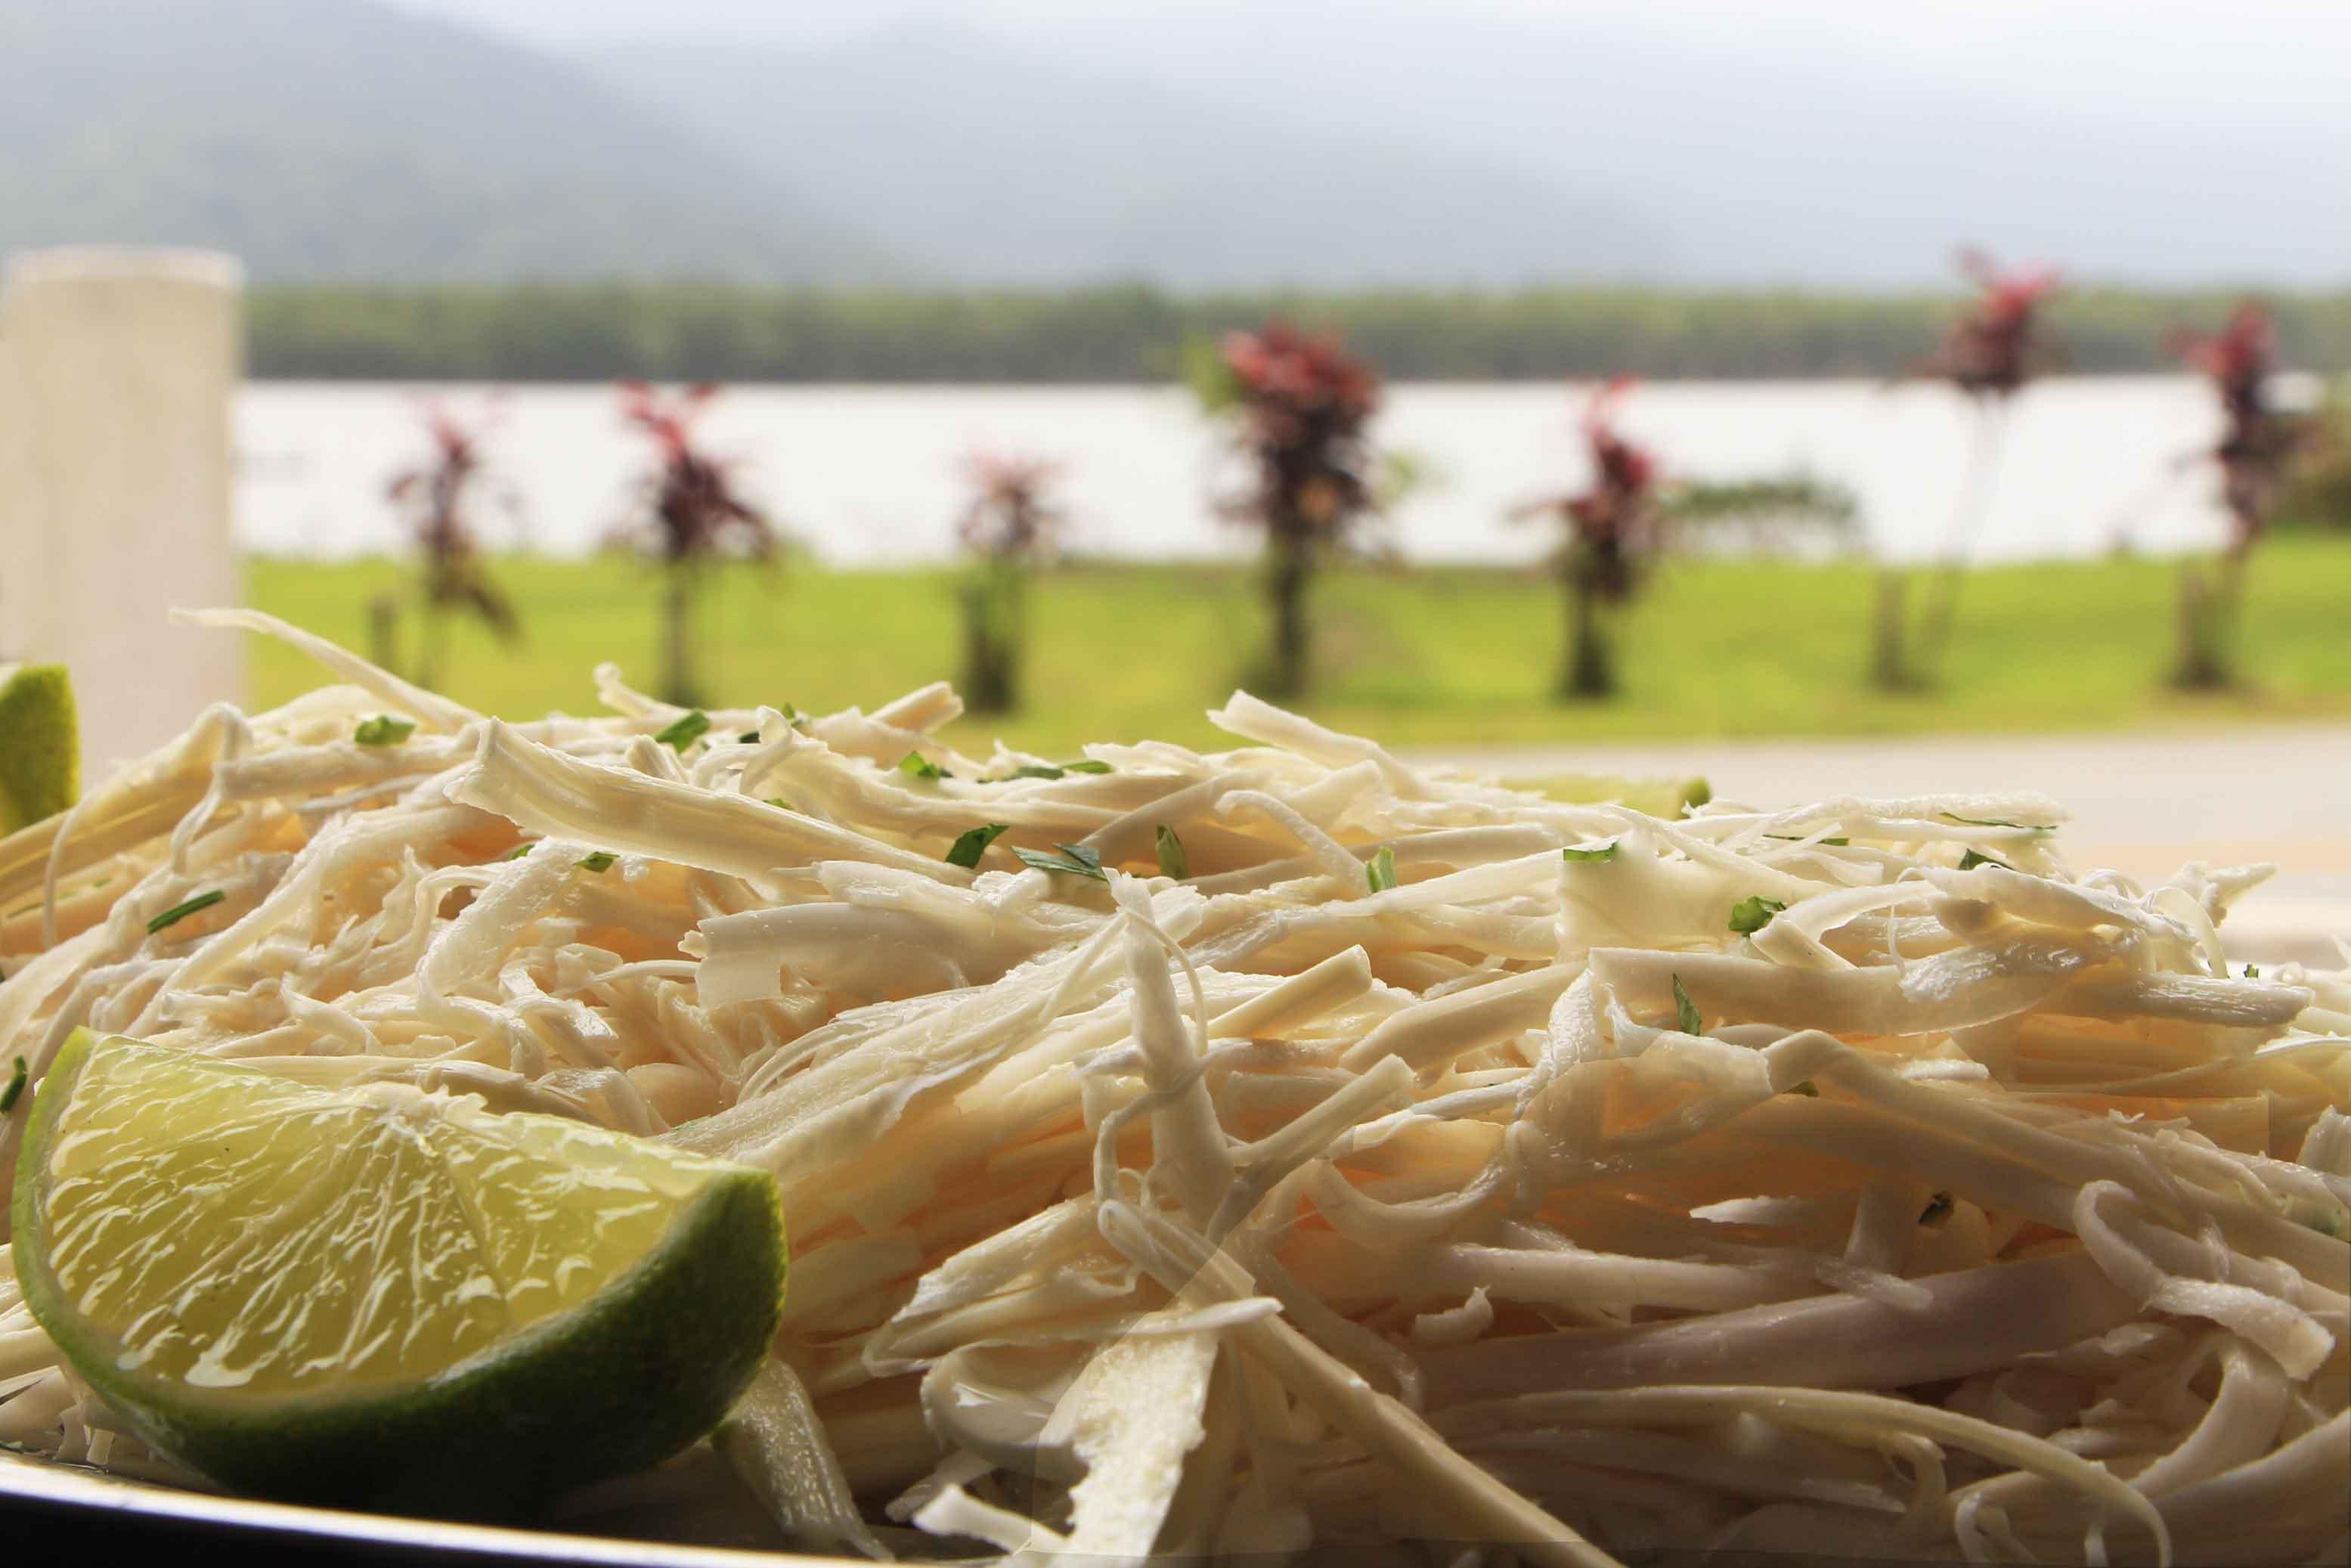 Guaruja-Gastronomia-pupunha-Salada-de-Palmito-cru-Rest-Joca-bx